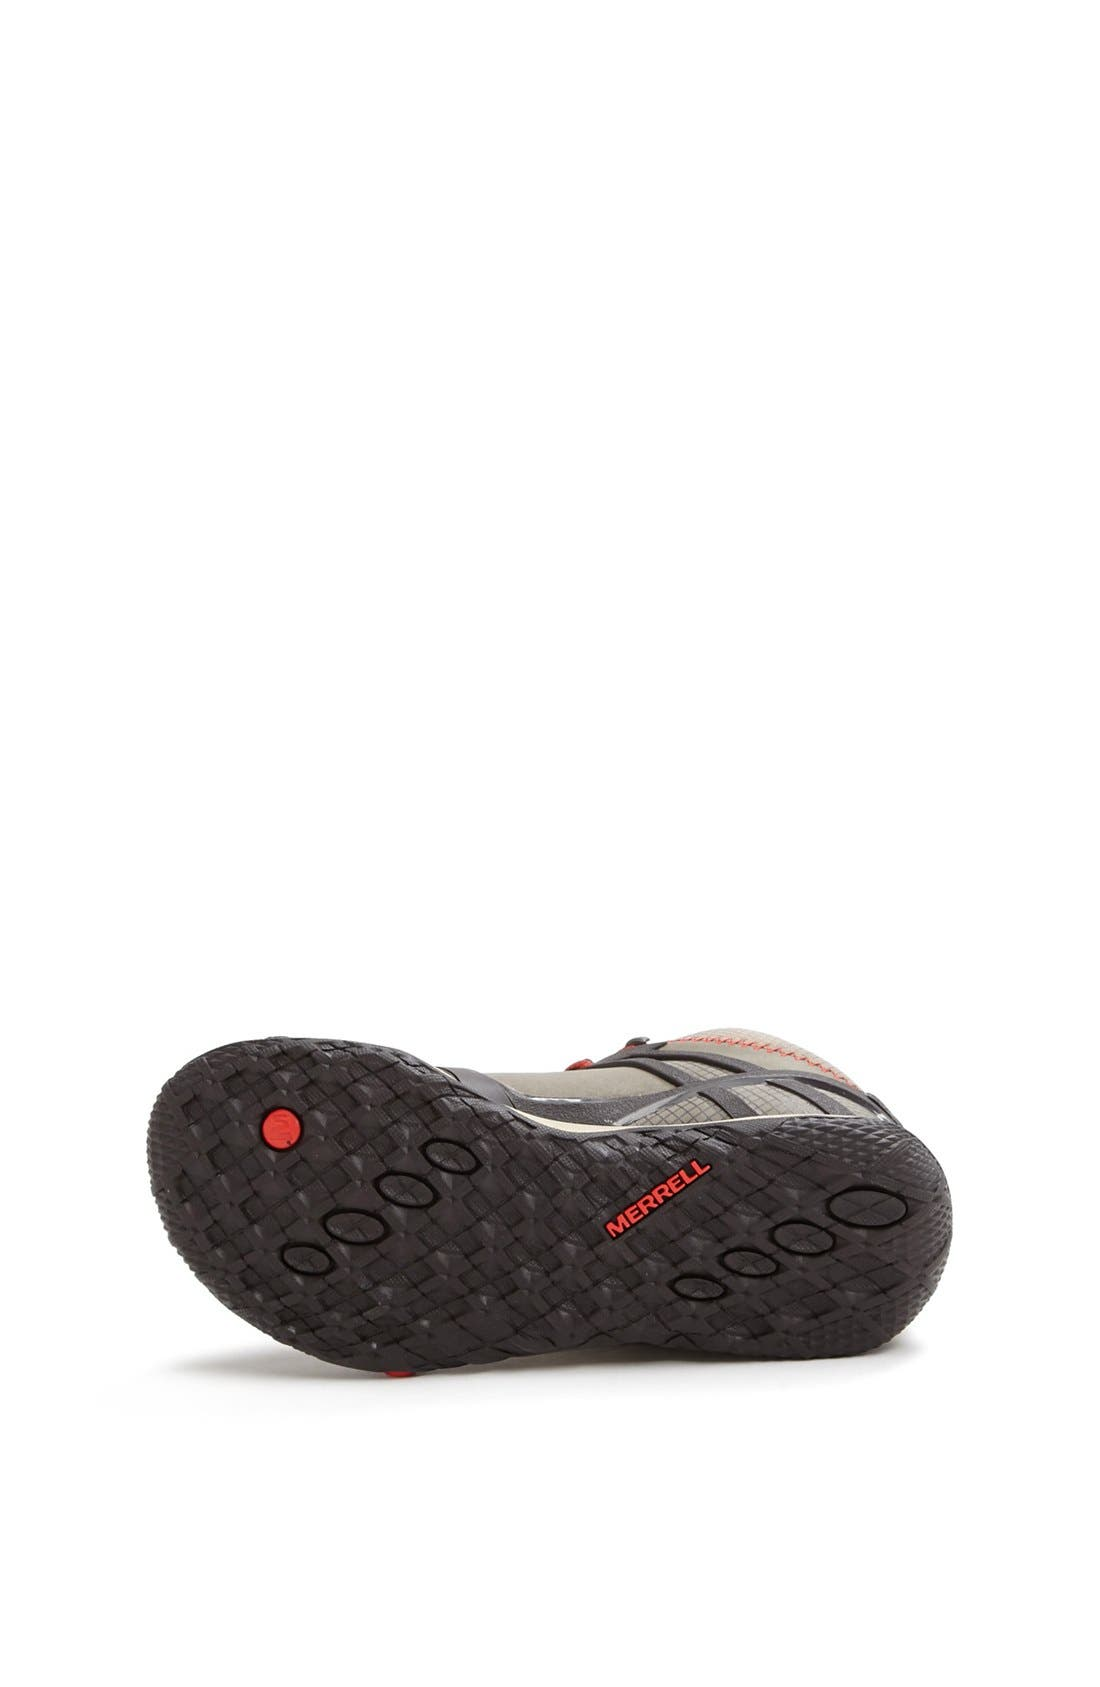 MERRELL,                             'Proterra' Mid High Waterproof Sneaker,                             Alternate thumbnail 4, color,                             201